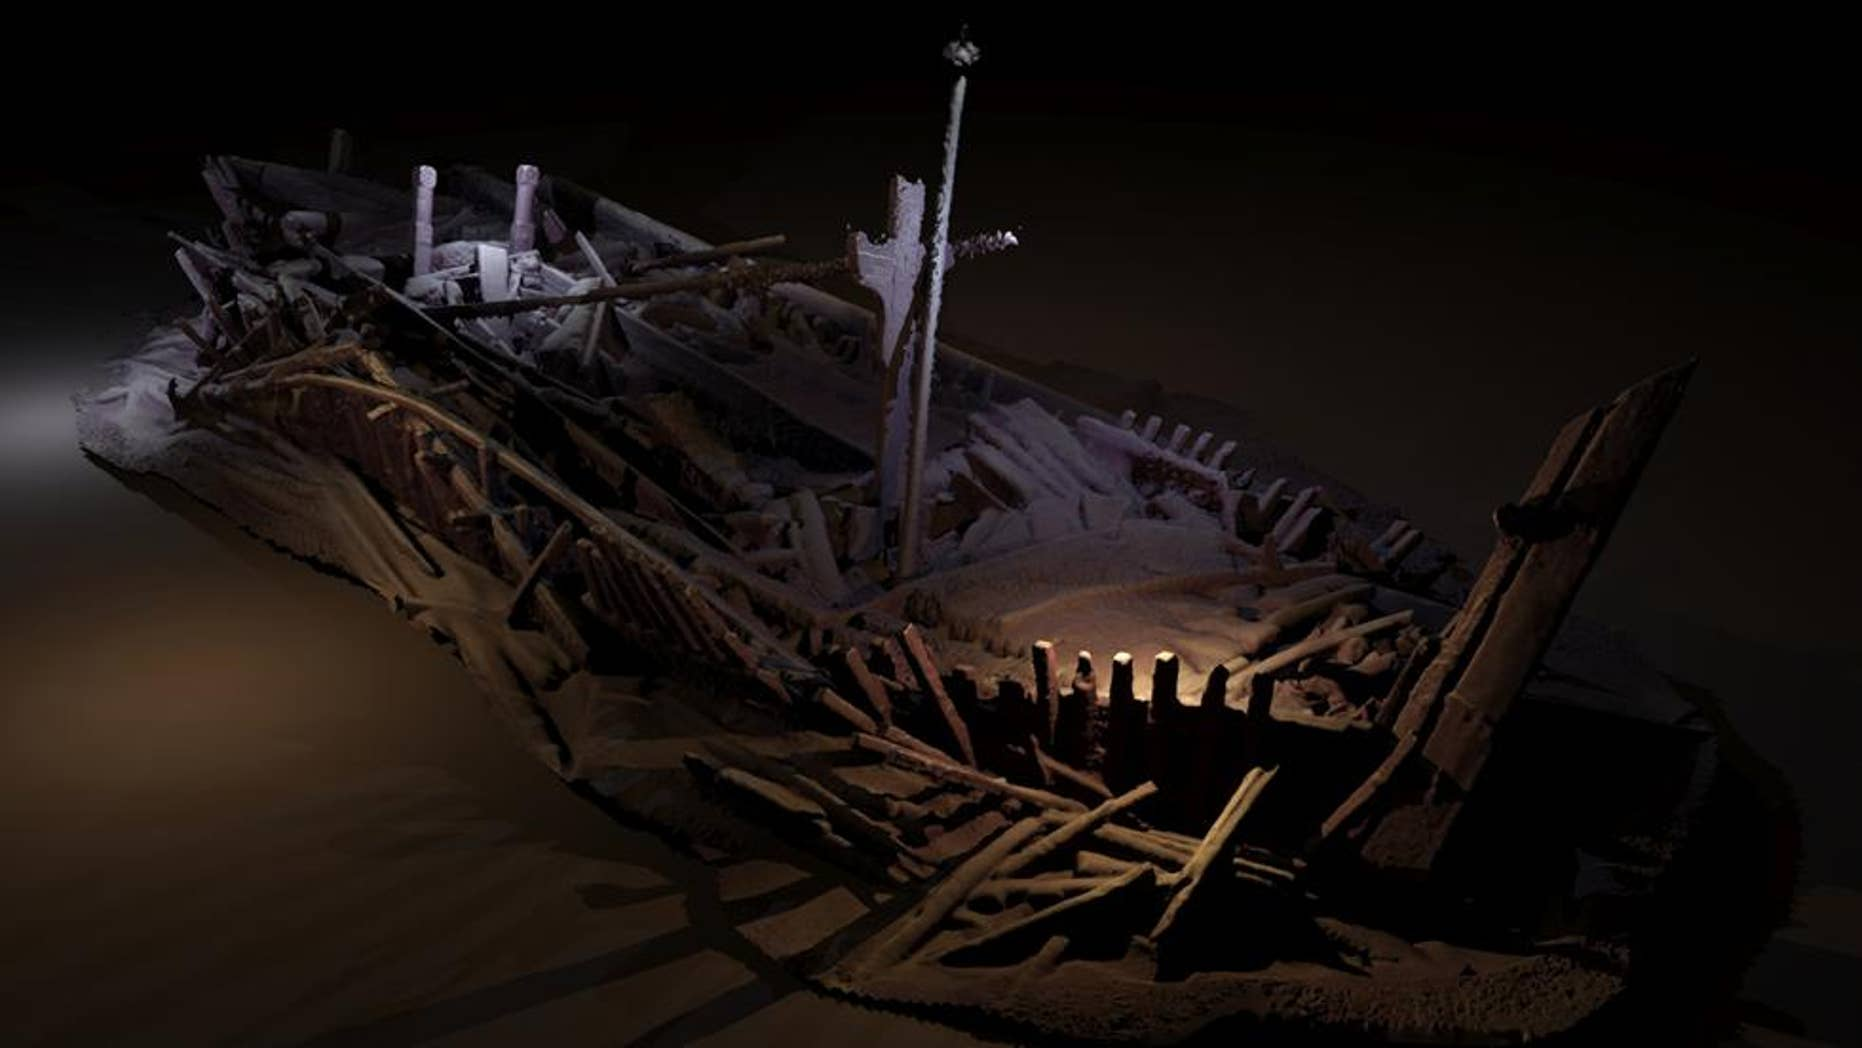 Photogrammetric model of a wreck from Ottoman period. (Credit: Rodrigo Pacheco-Ruiz/University of Southampton)